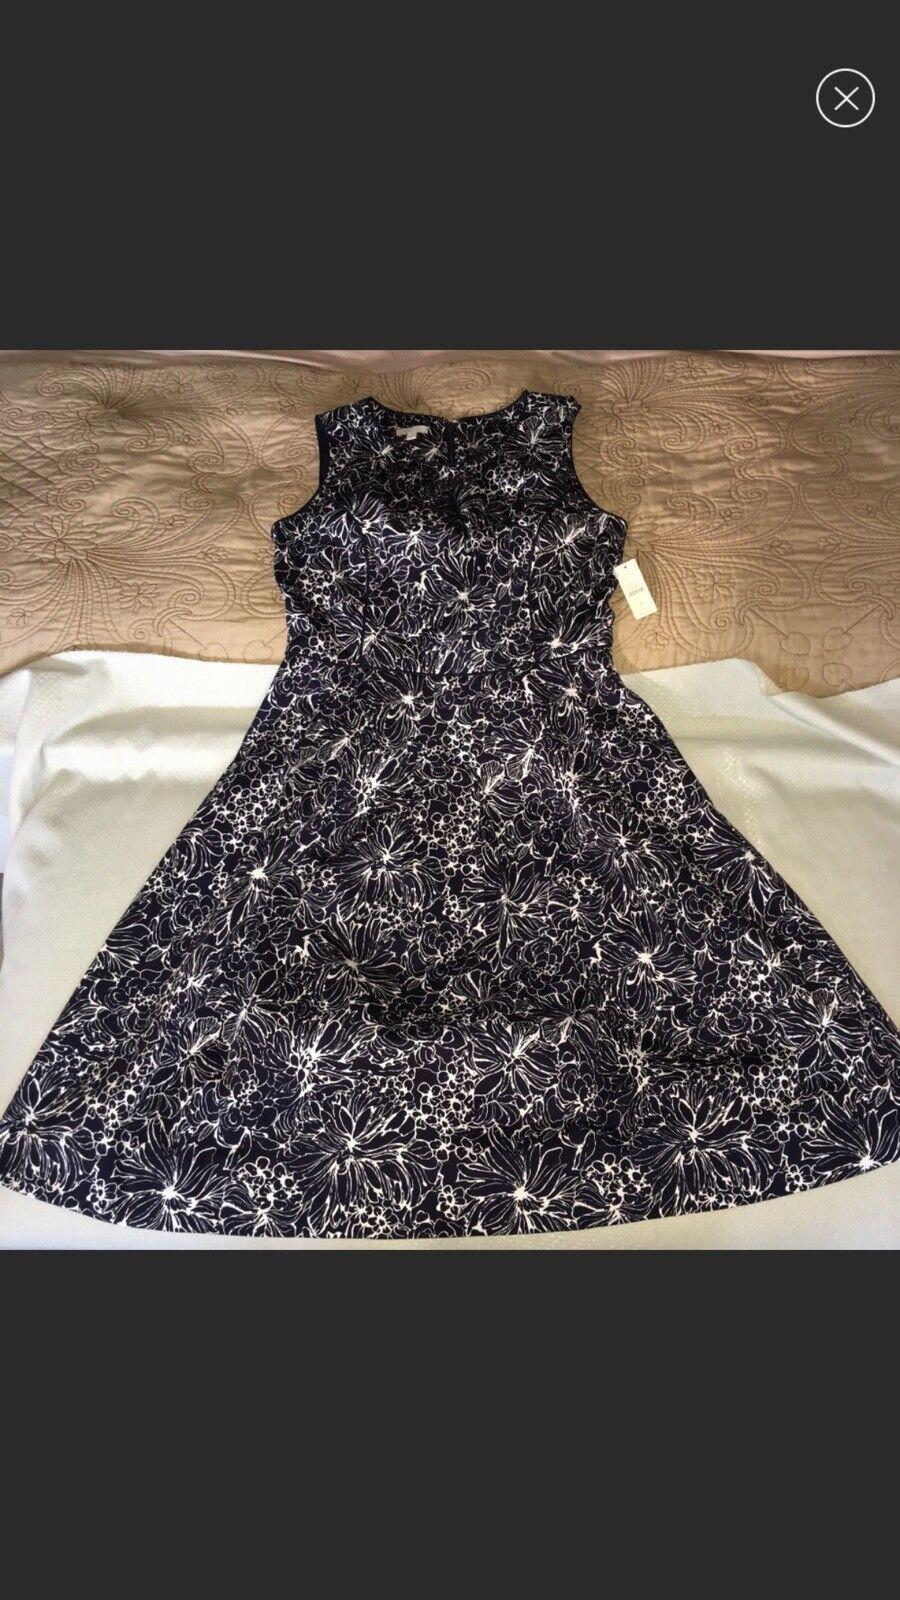 fce1aaf7f6ed4 Talbots Talbots Talbots Petite NWT Navy White Floral Print Dress 6P 43ebbf